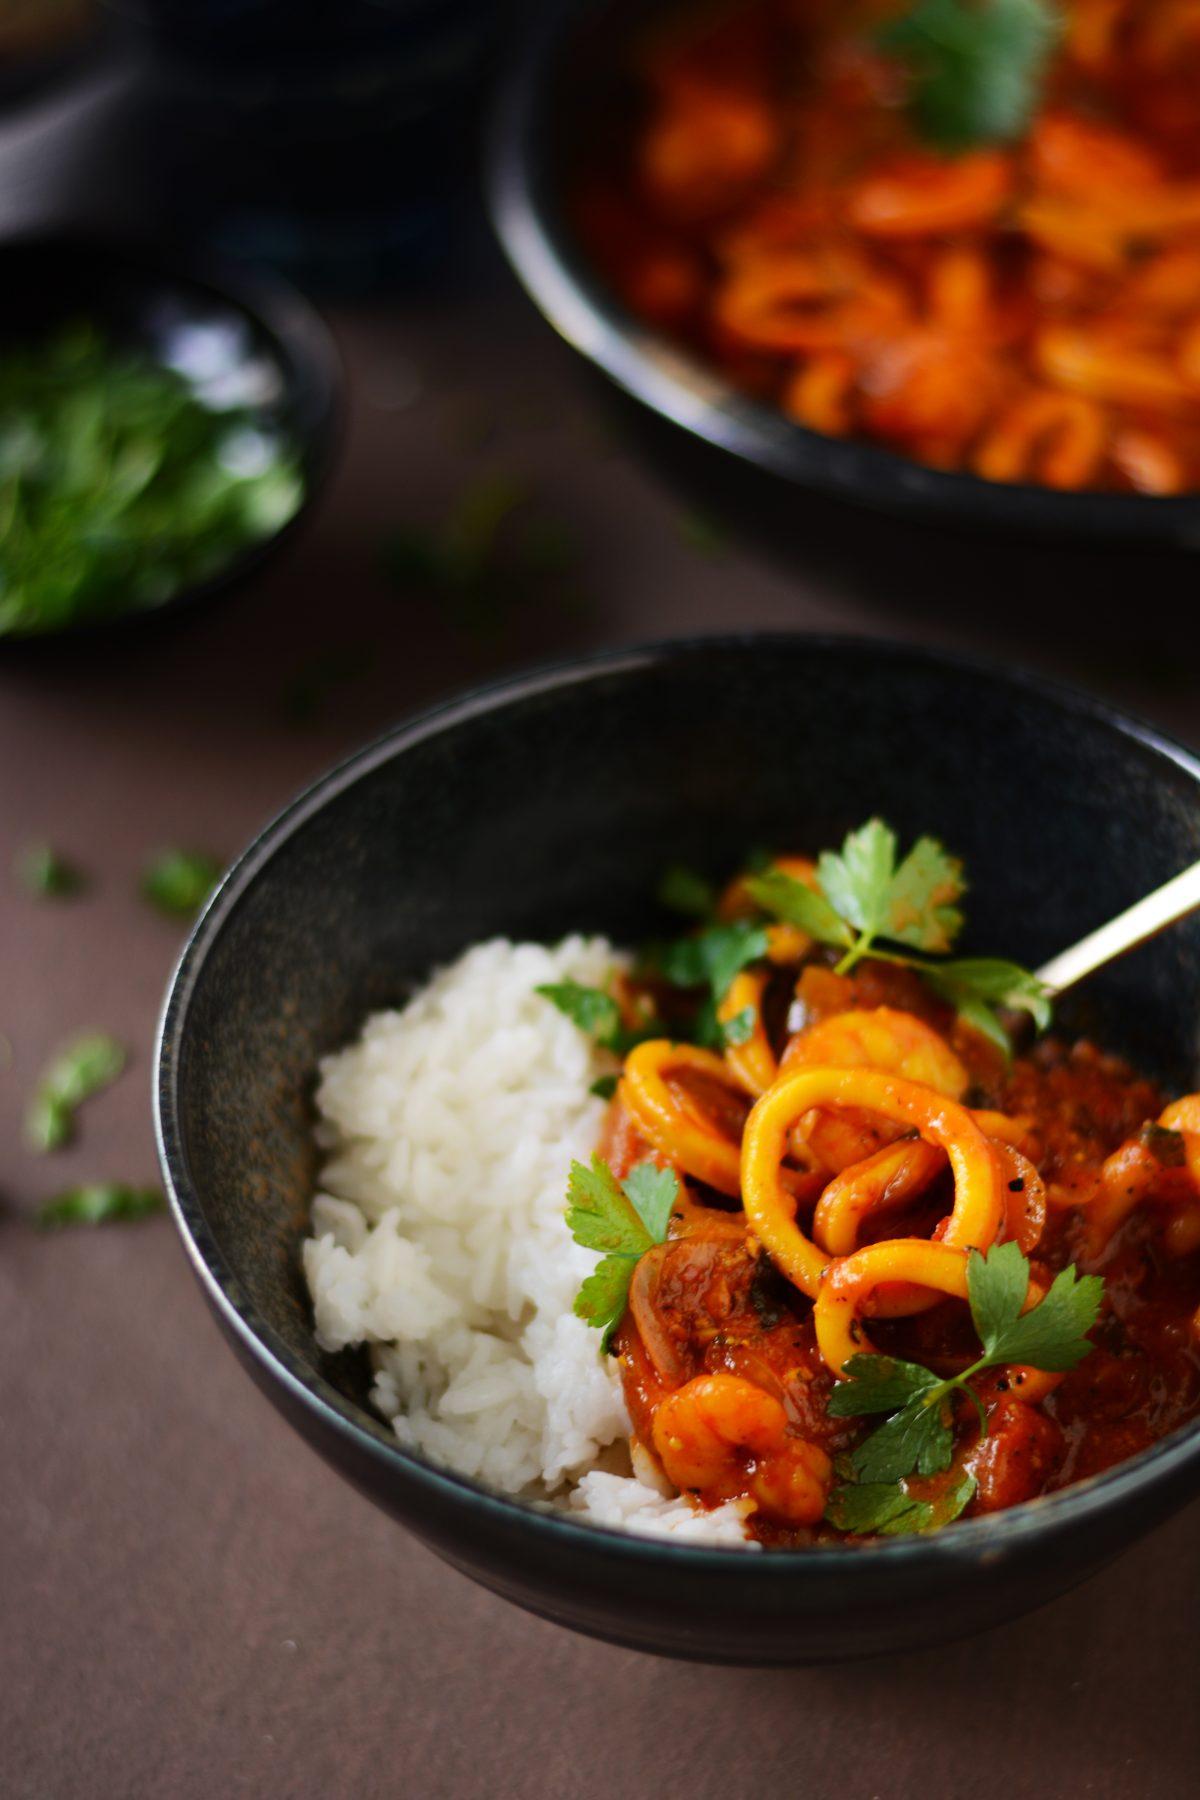 Squid, prawn and saffron stew - an indulgent, rich and delicious seafood stew with saffron - thespiceadventuress.com